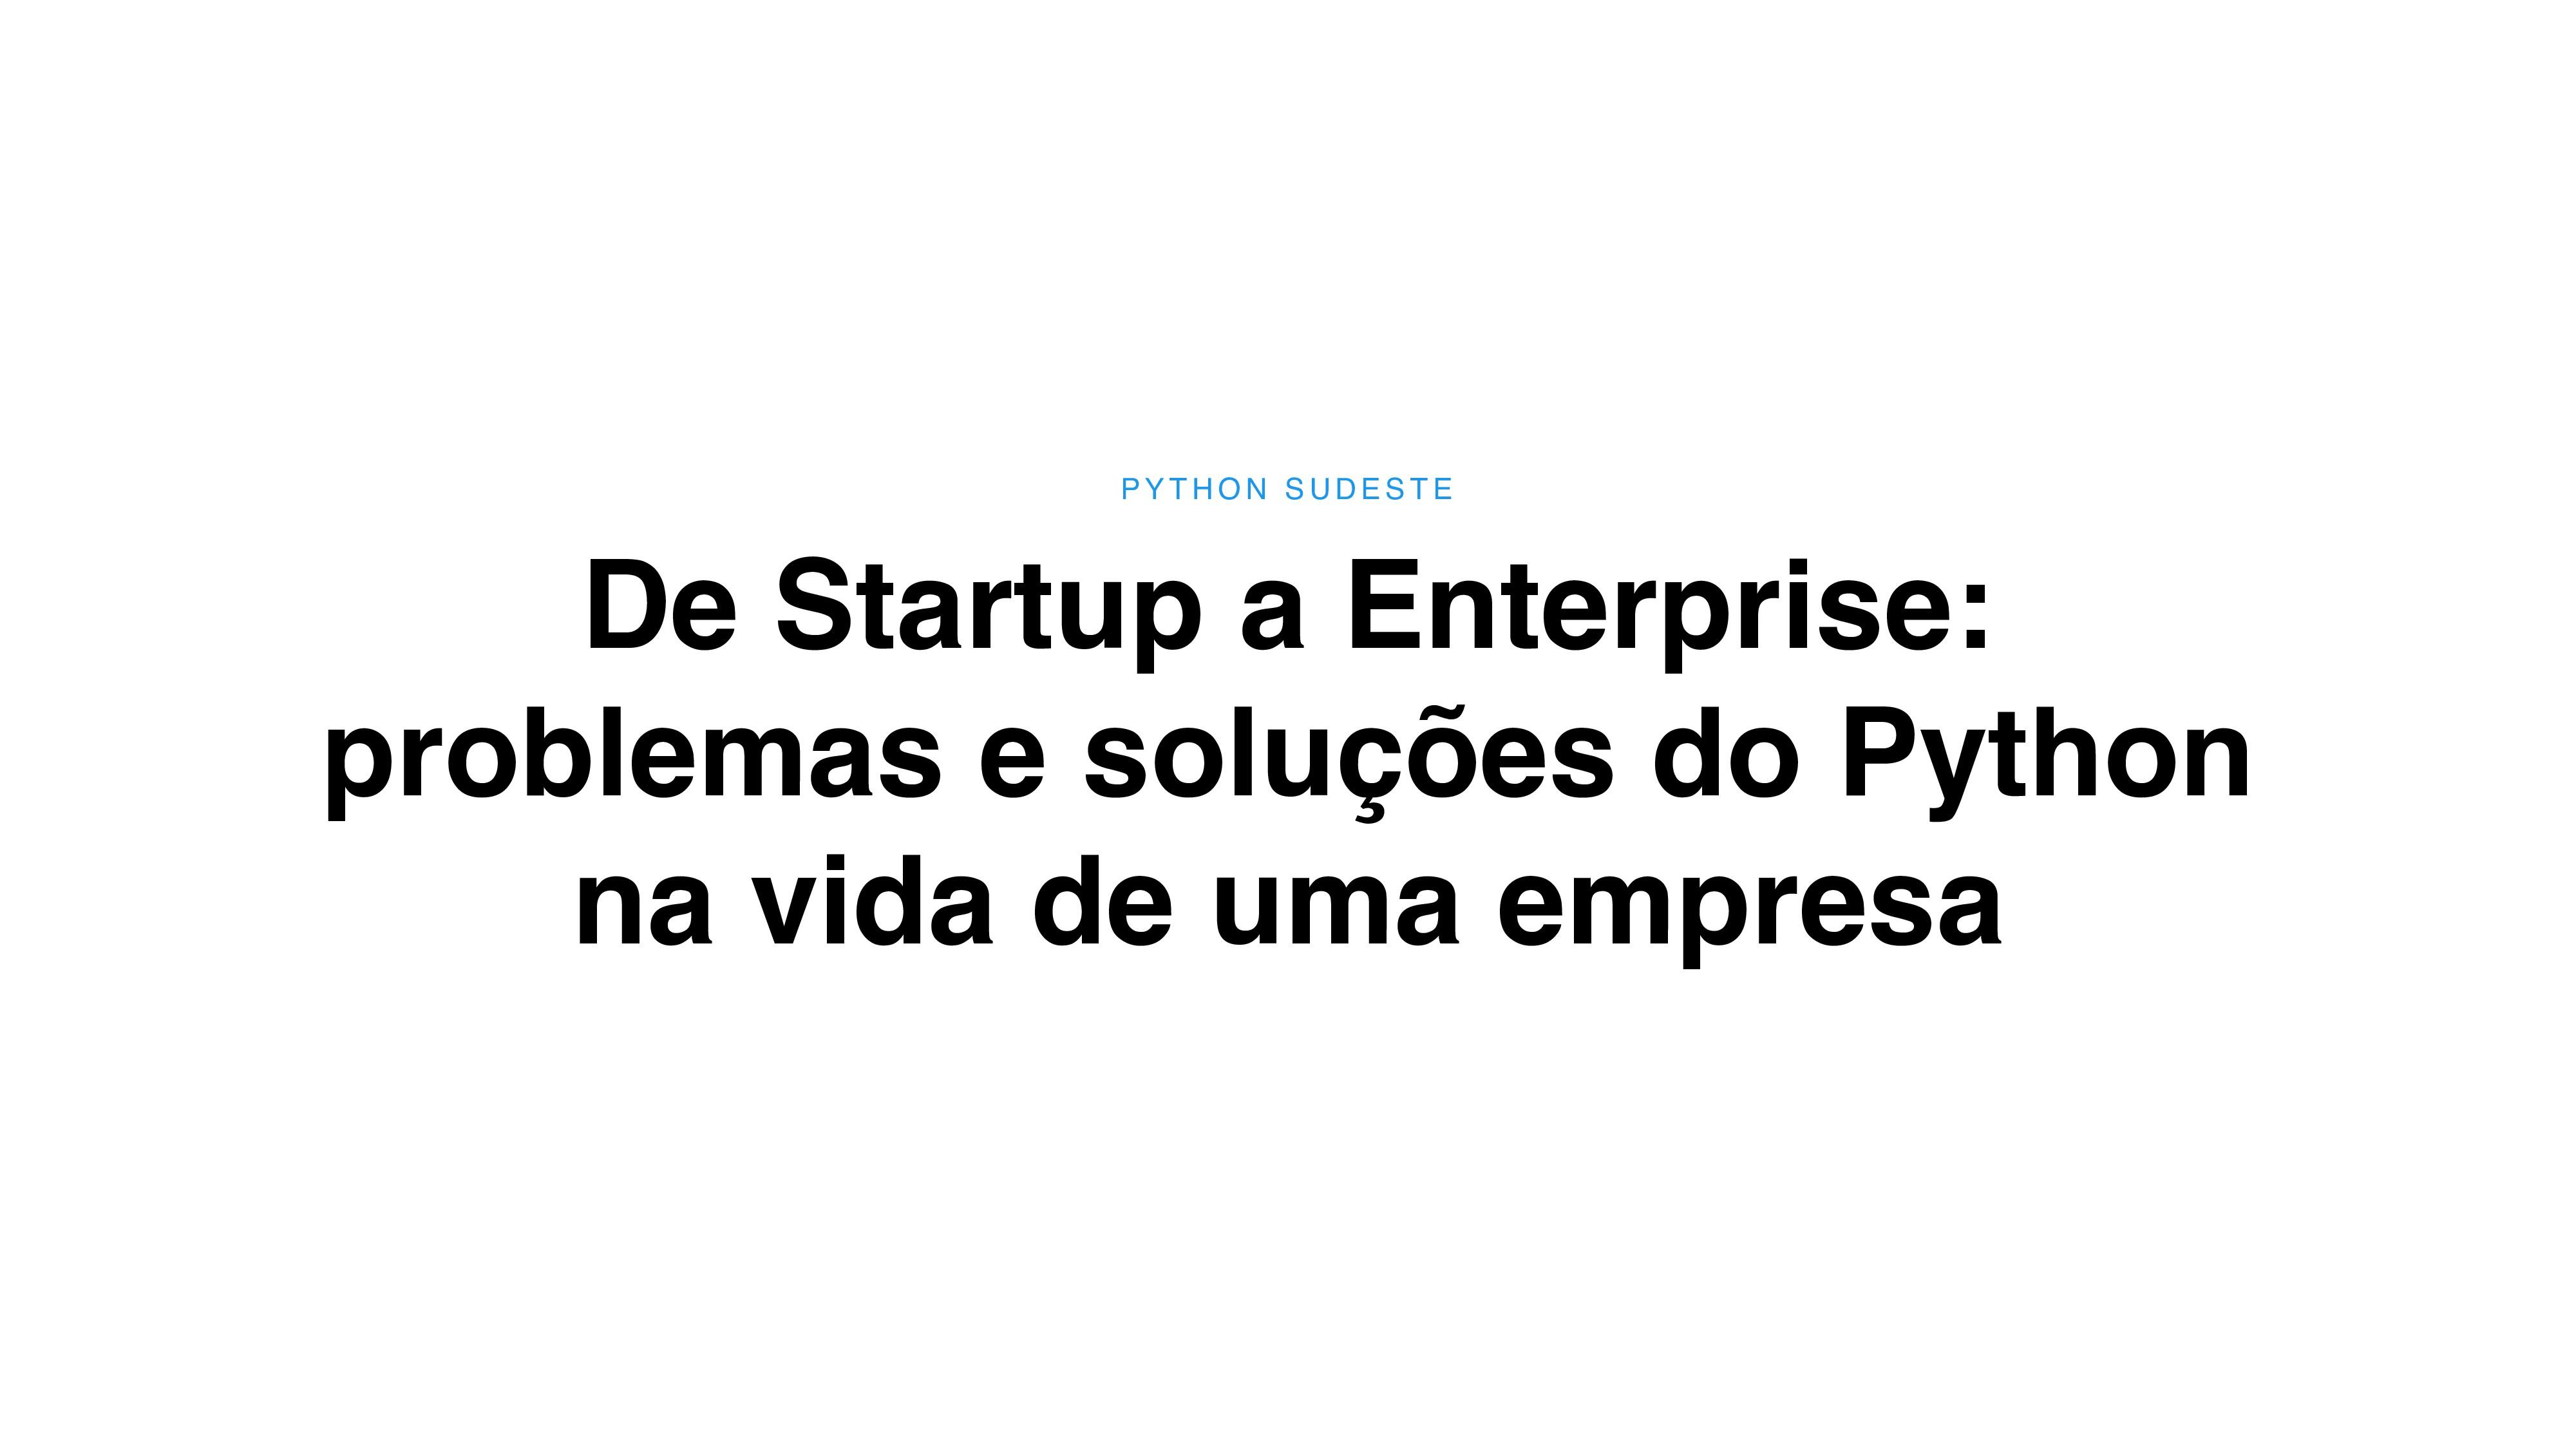 De Startup a Enterprise: problemas e soluções d...